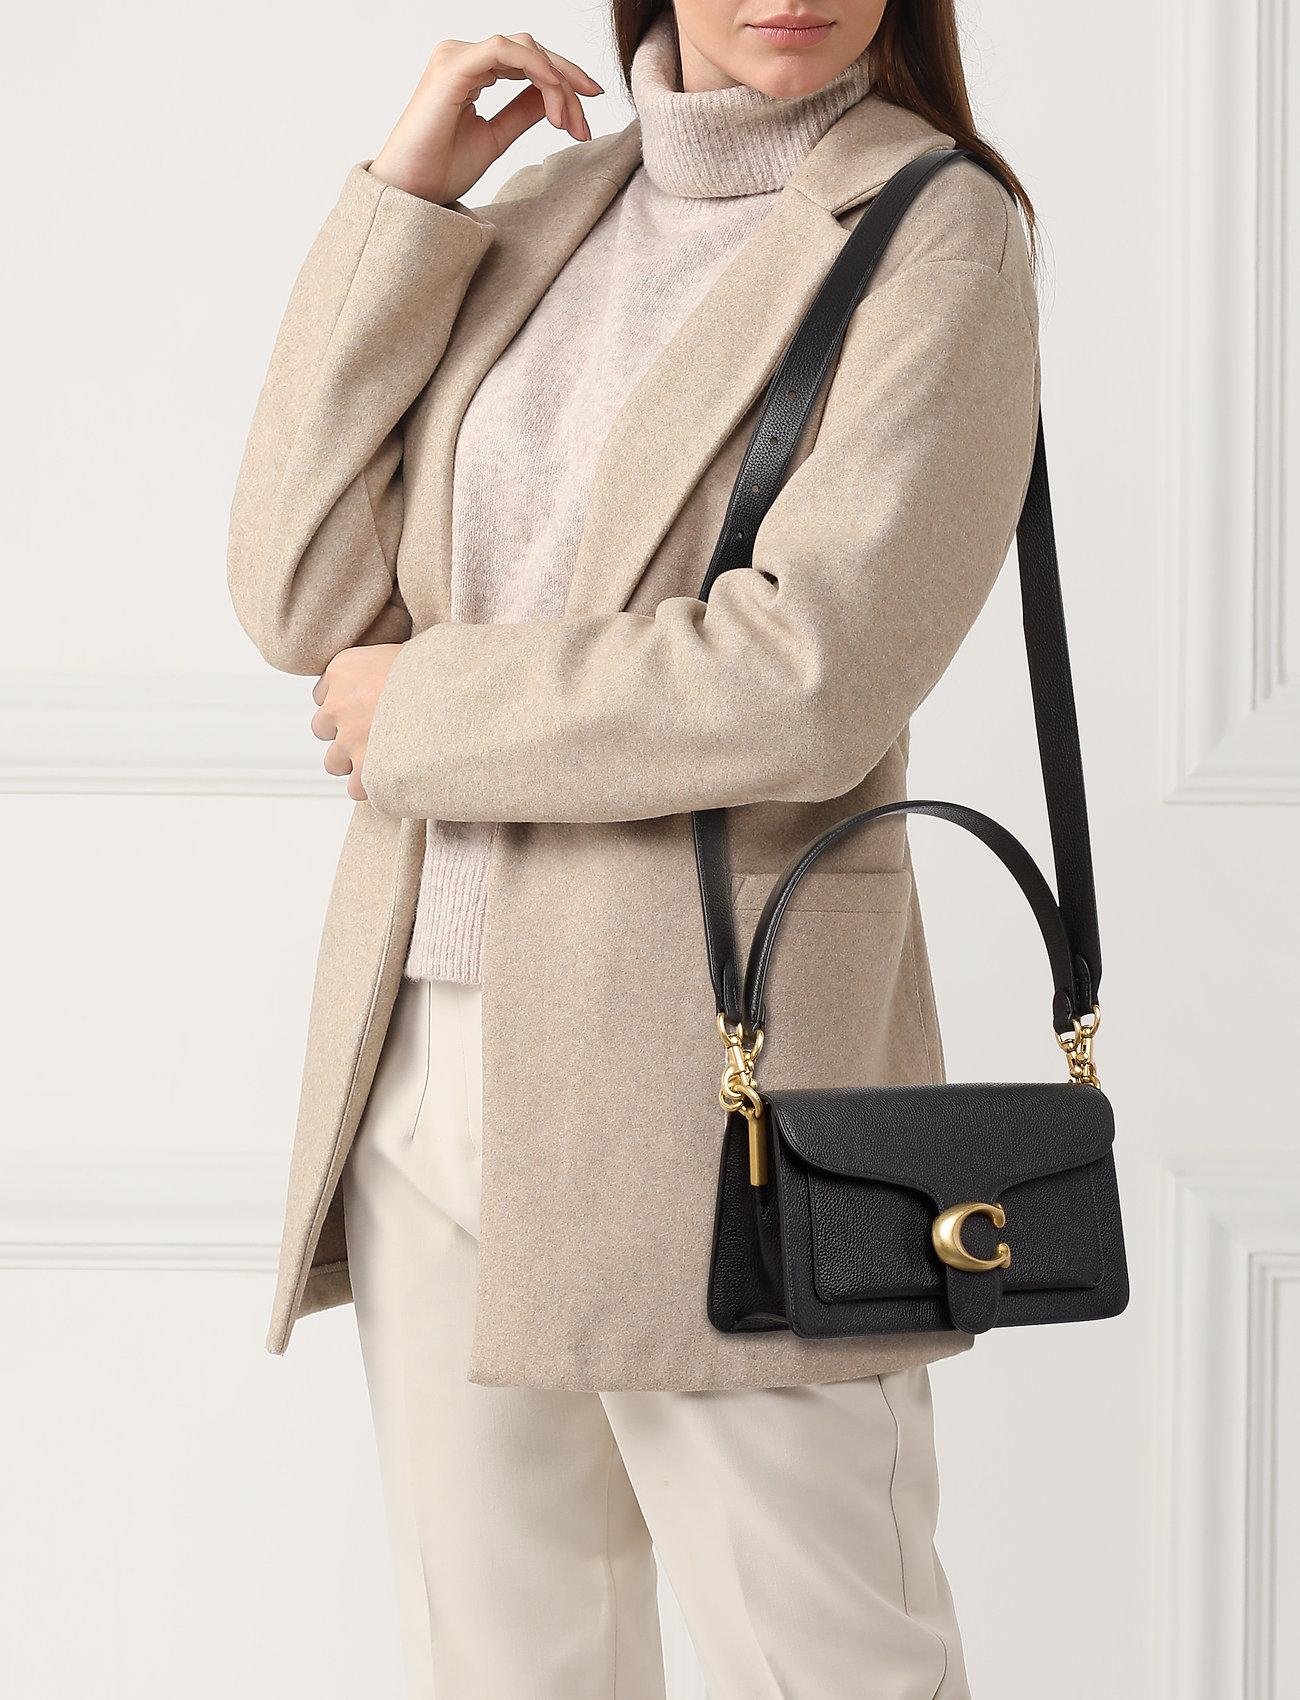 Coach Polished Pebble Leather Tabby Shoulder Bag 26 - B4/BLACK 2